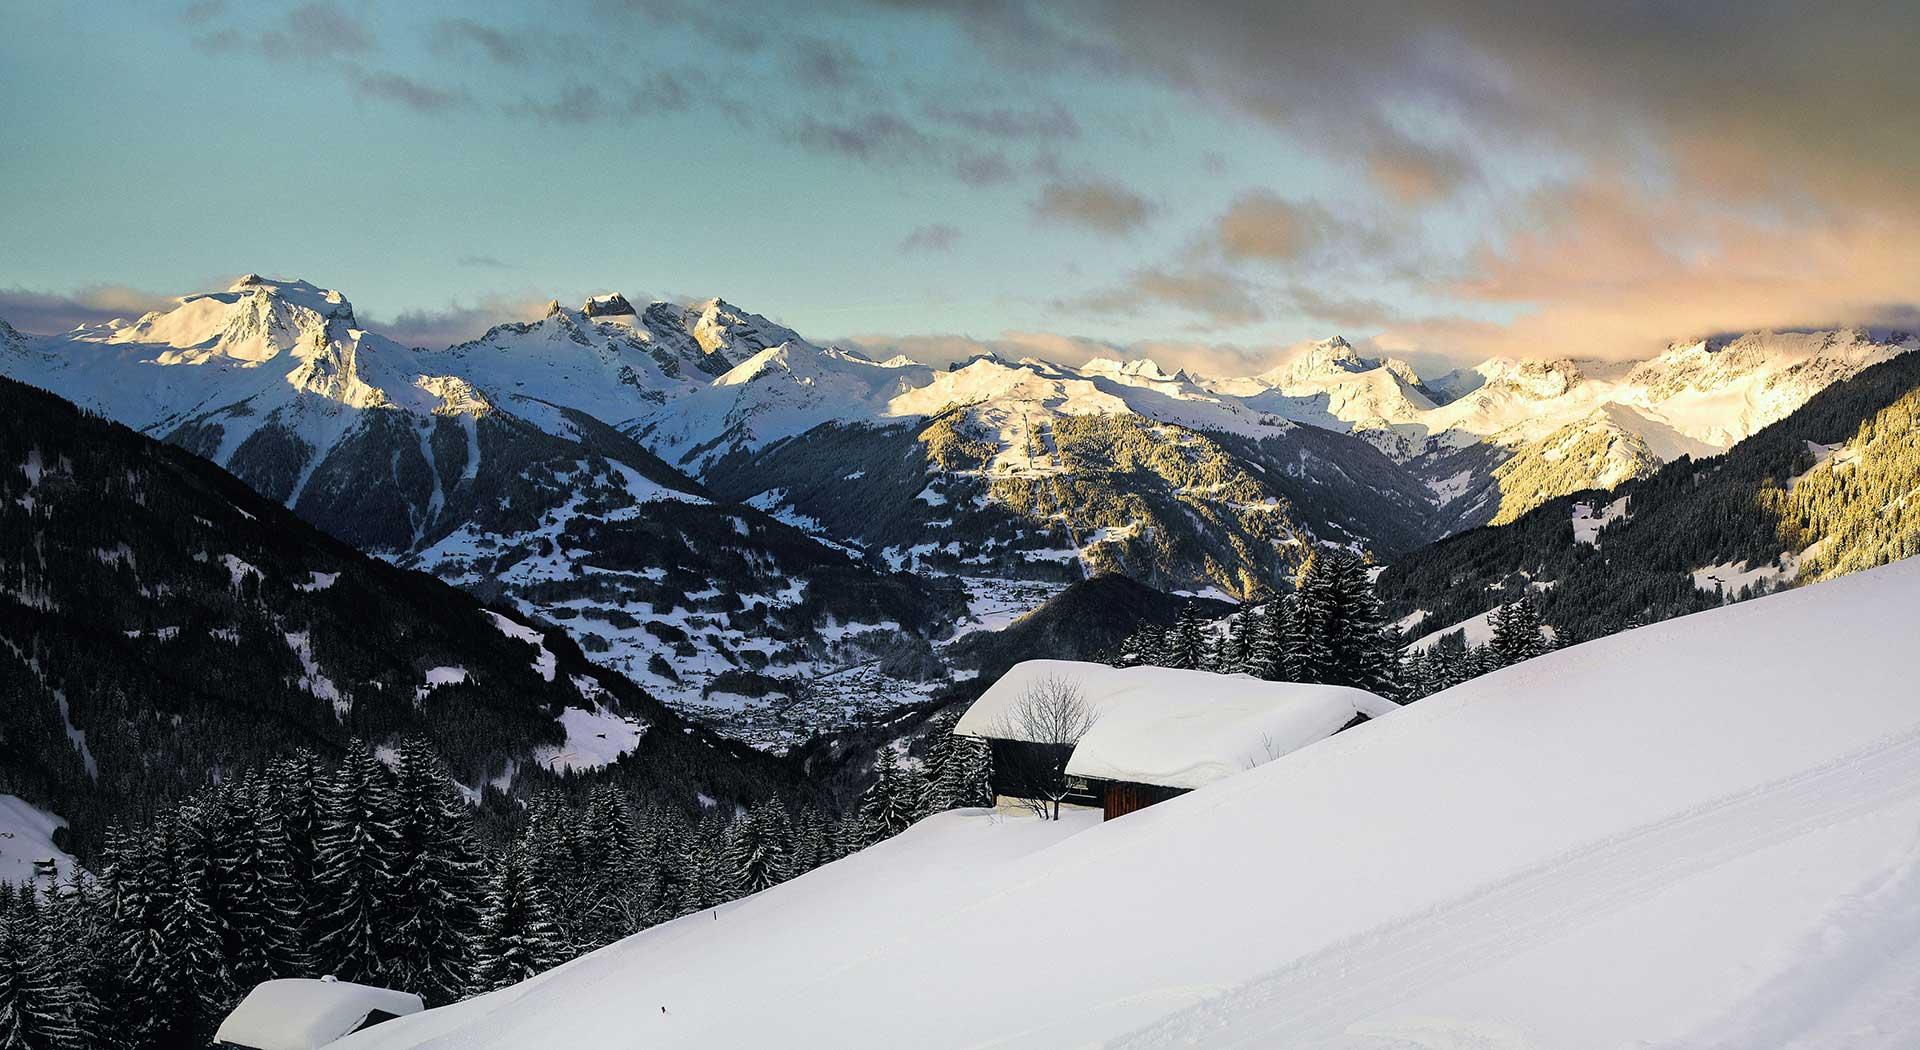 Winterurlaub im Montafon, Vorarlberg